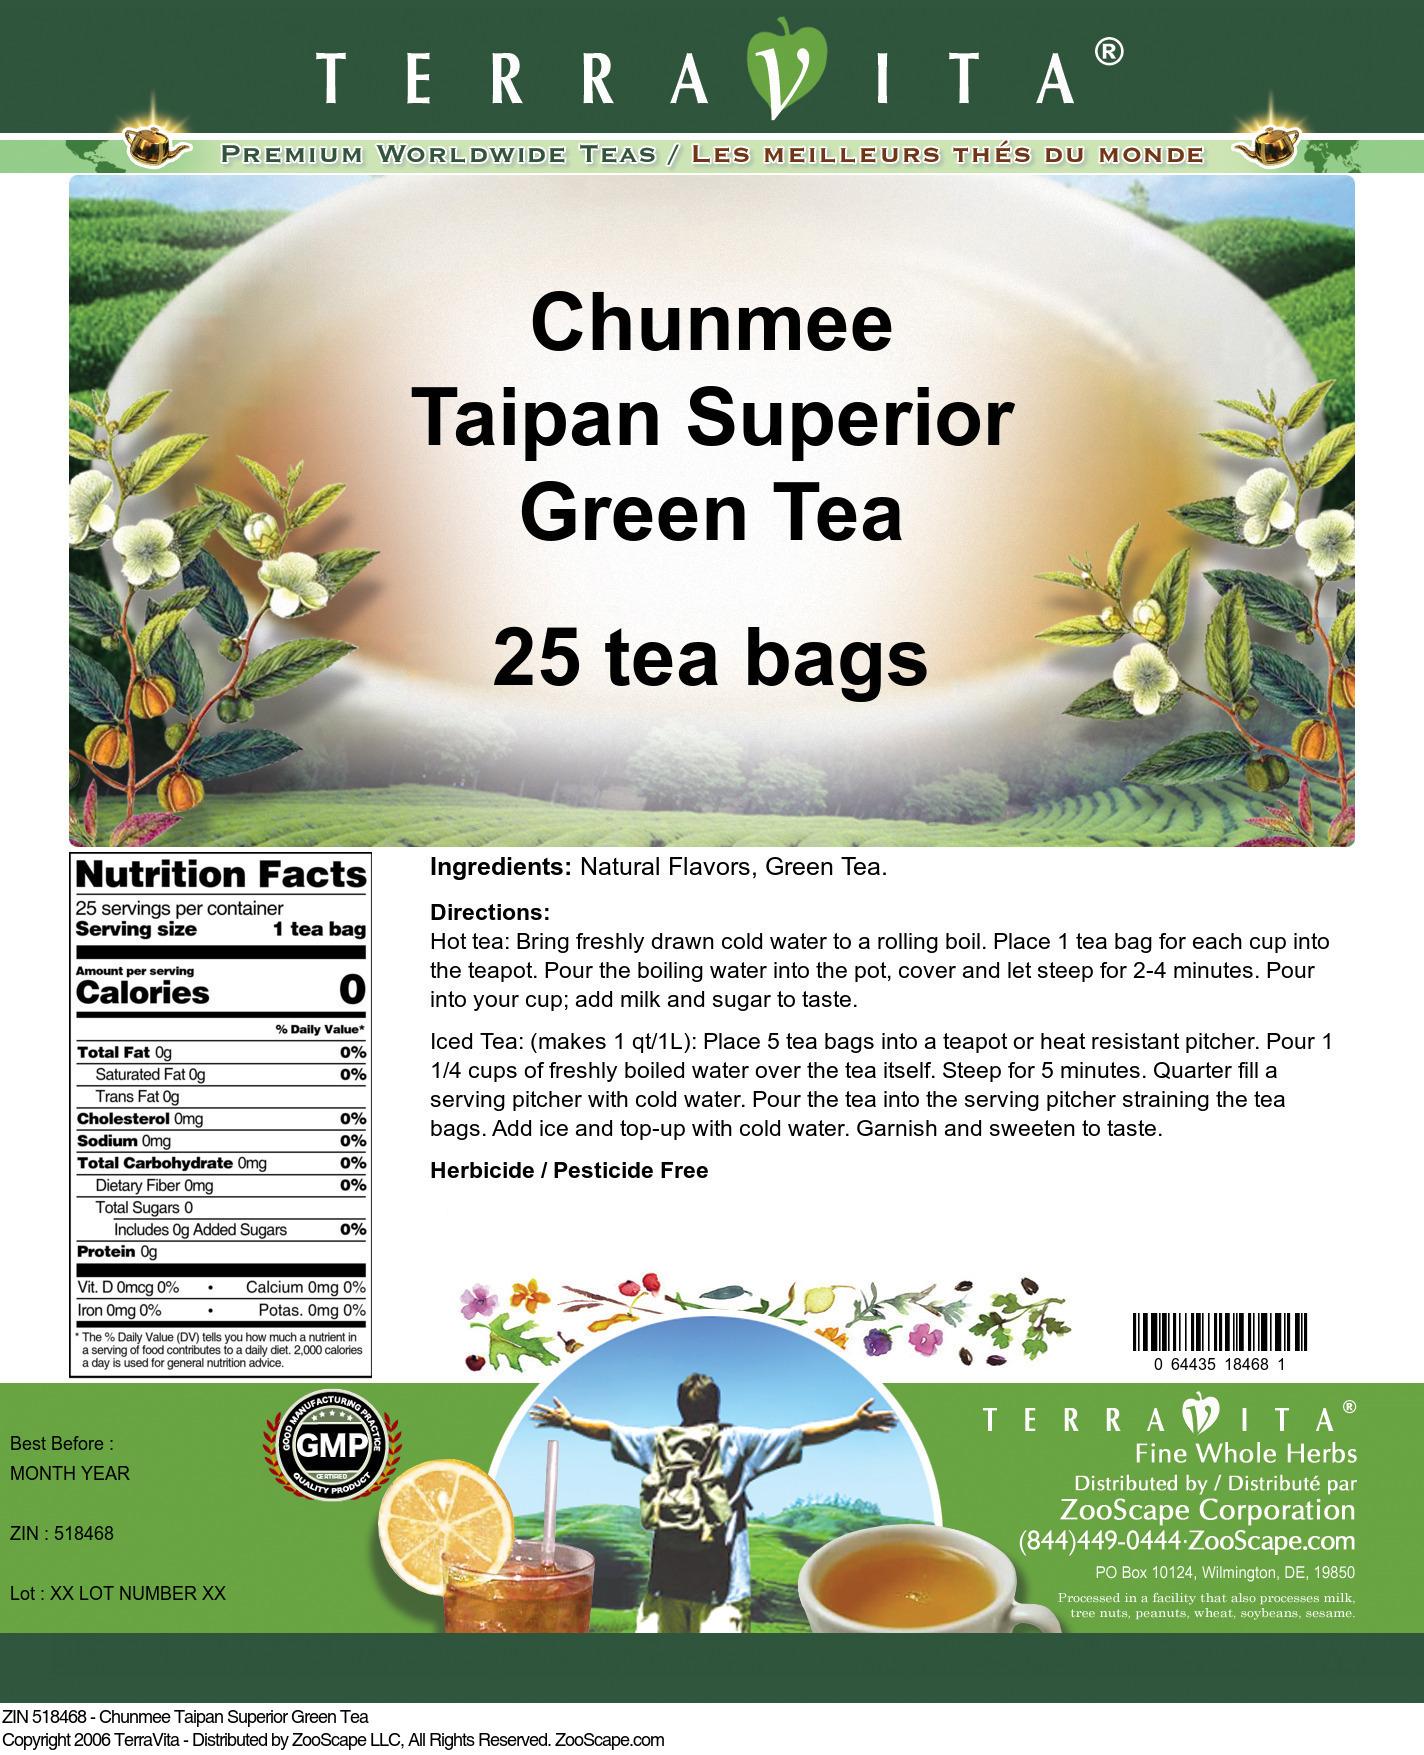 Chunmee Taipan Superior Green Tea